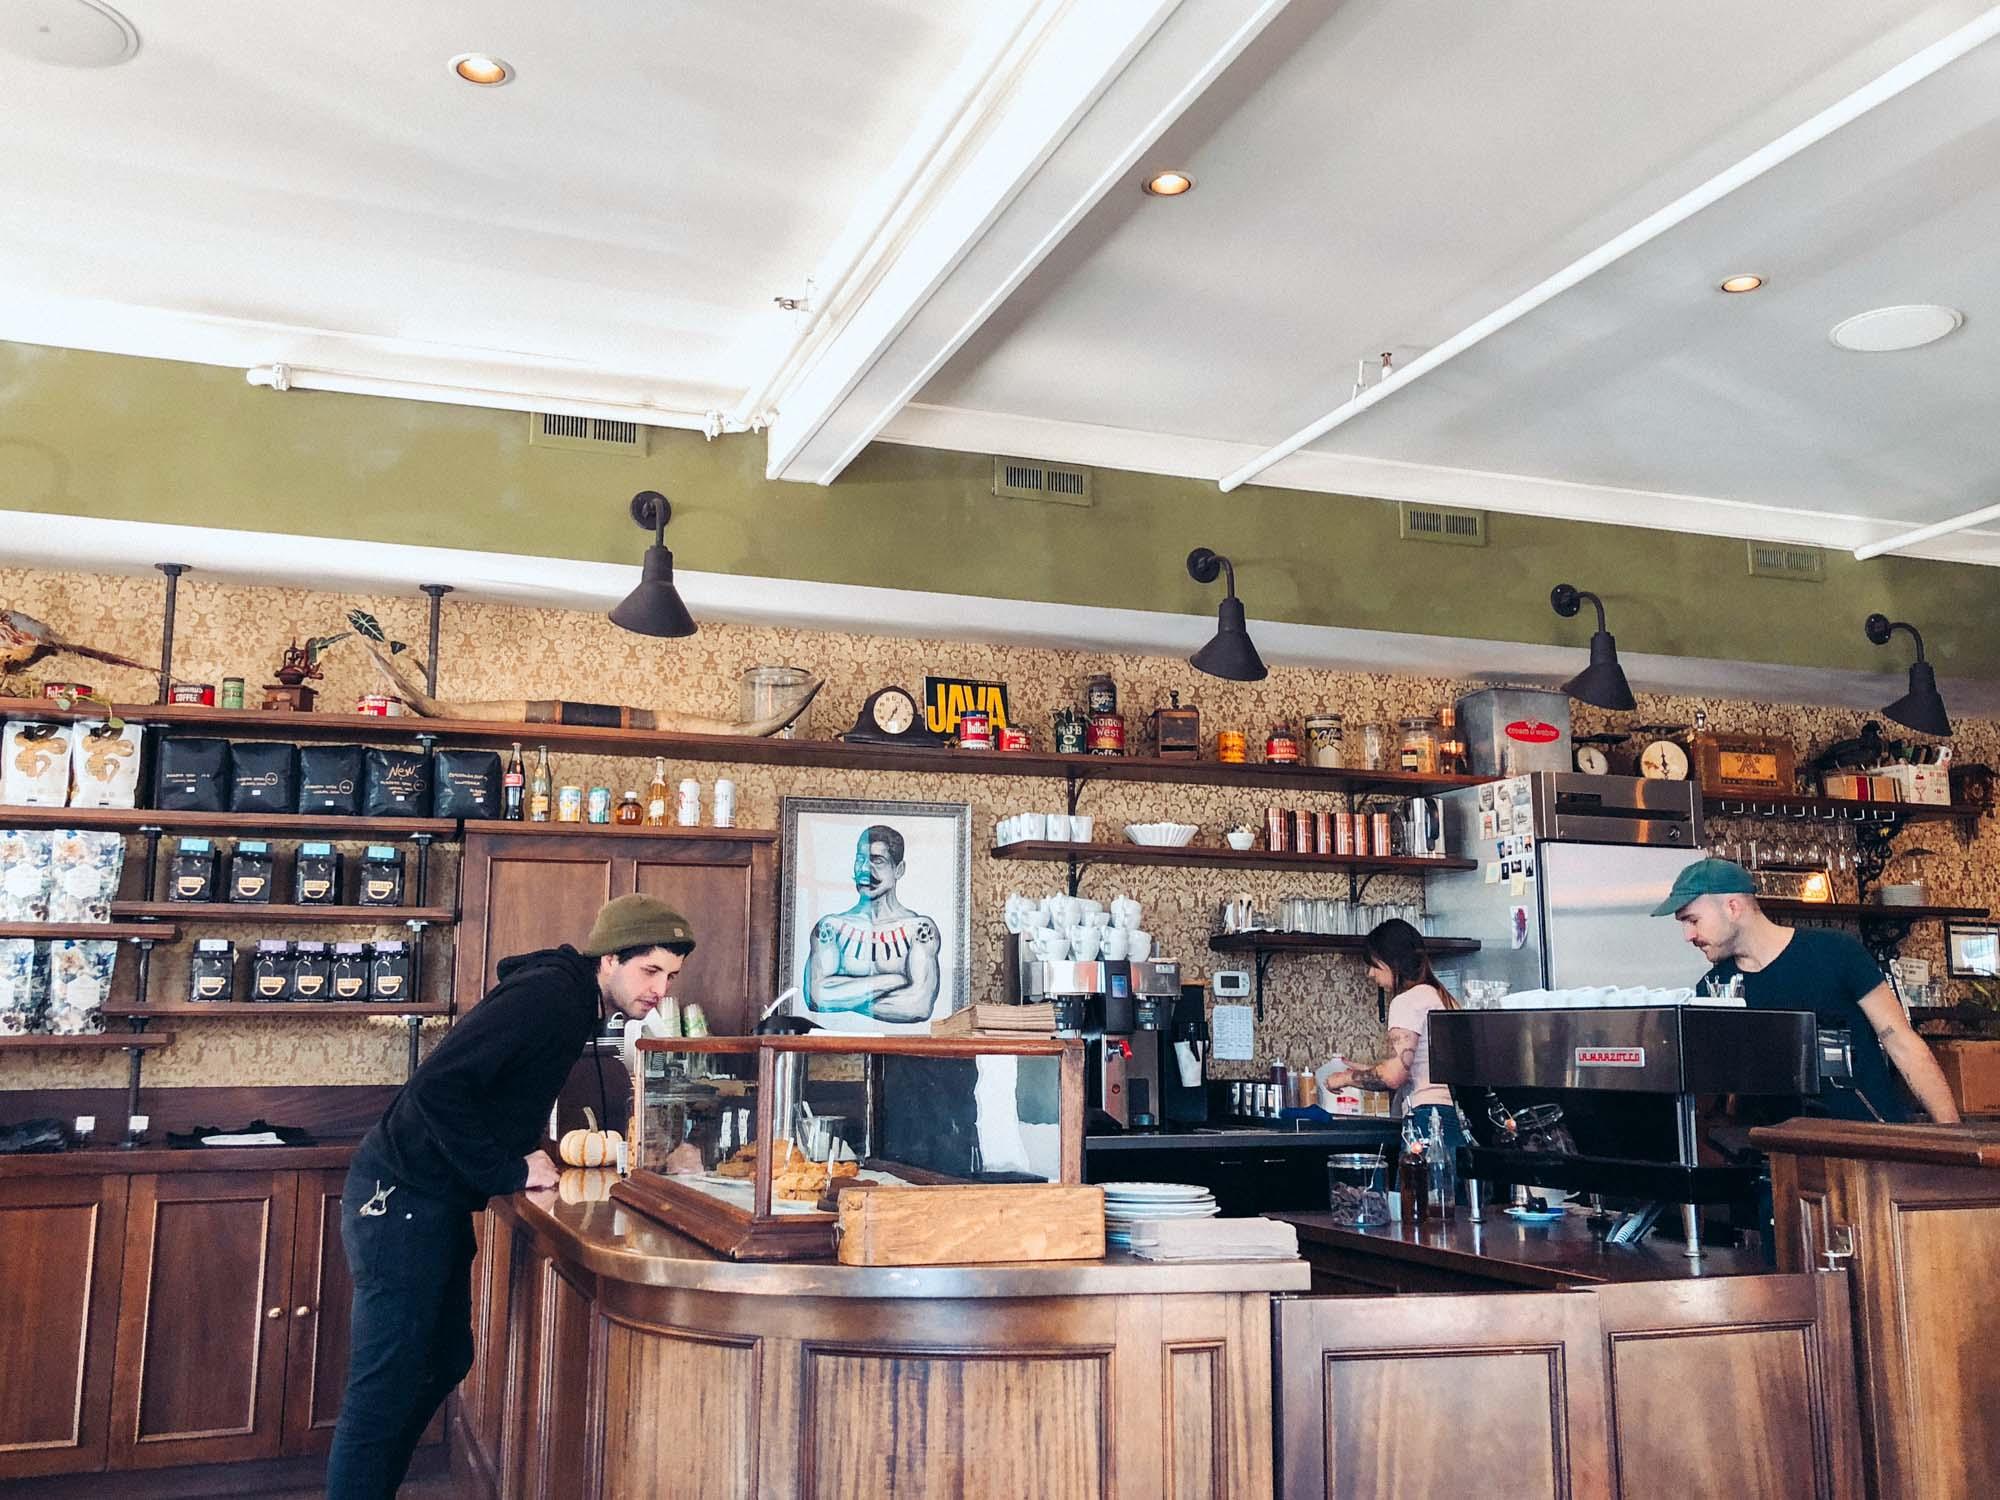 Best vegetarian-friendly restaurants and cafes in Alberta Arts District - Barista